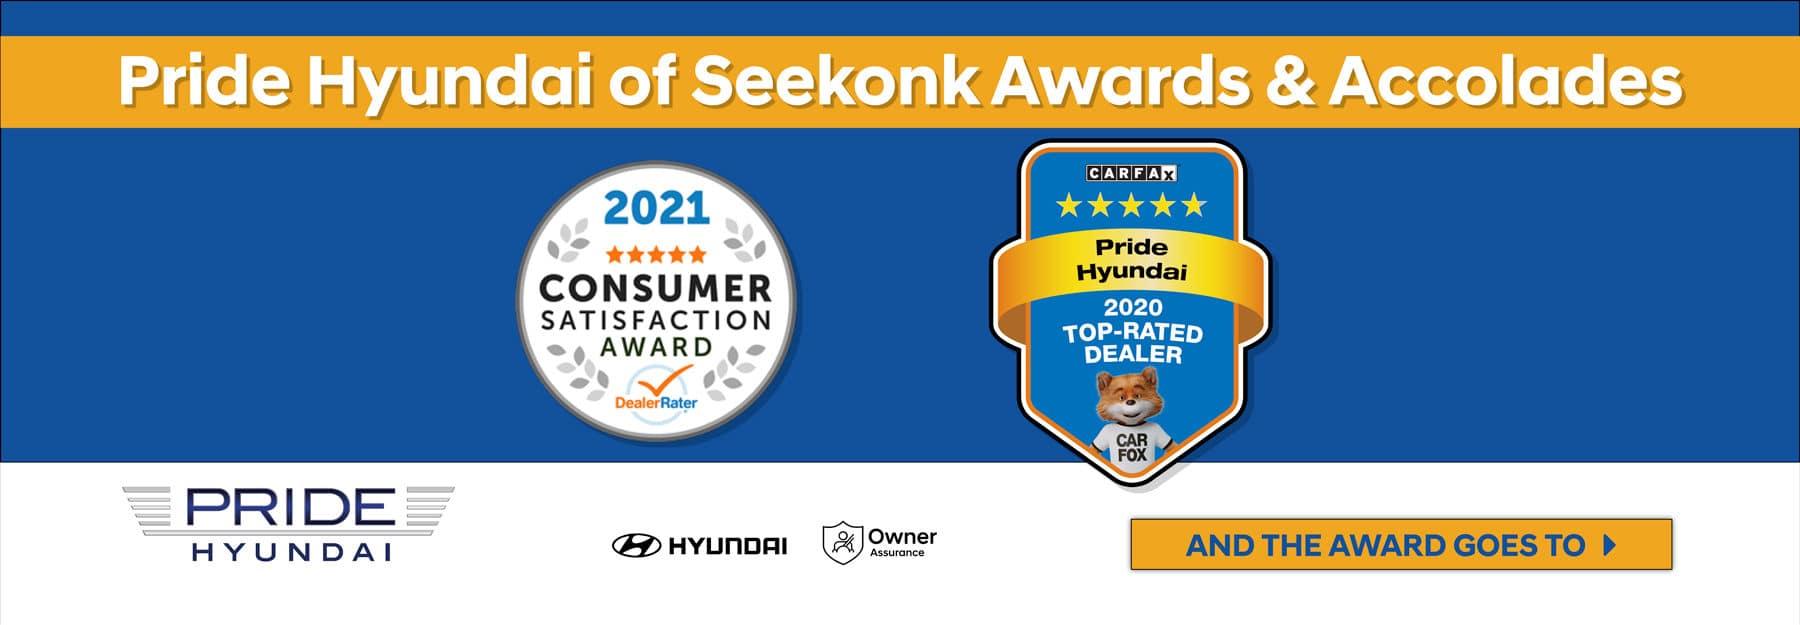 2021.03.30-Pride-Hyundai-APR-Web-Award-Logos-S51622cr